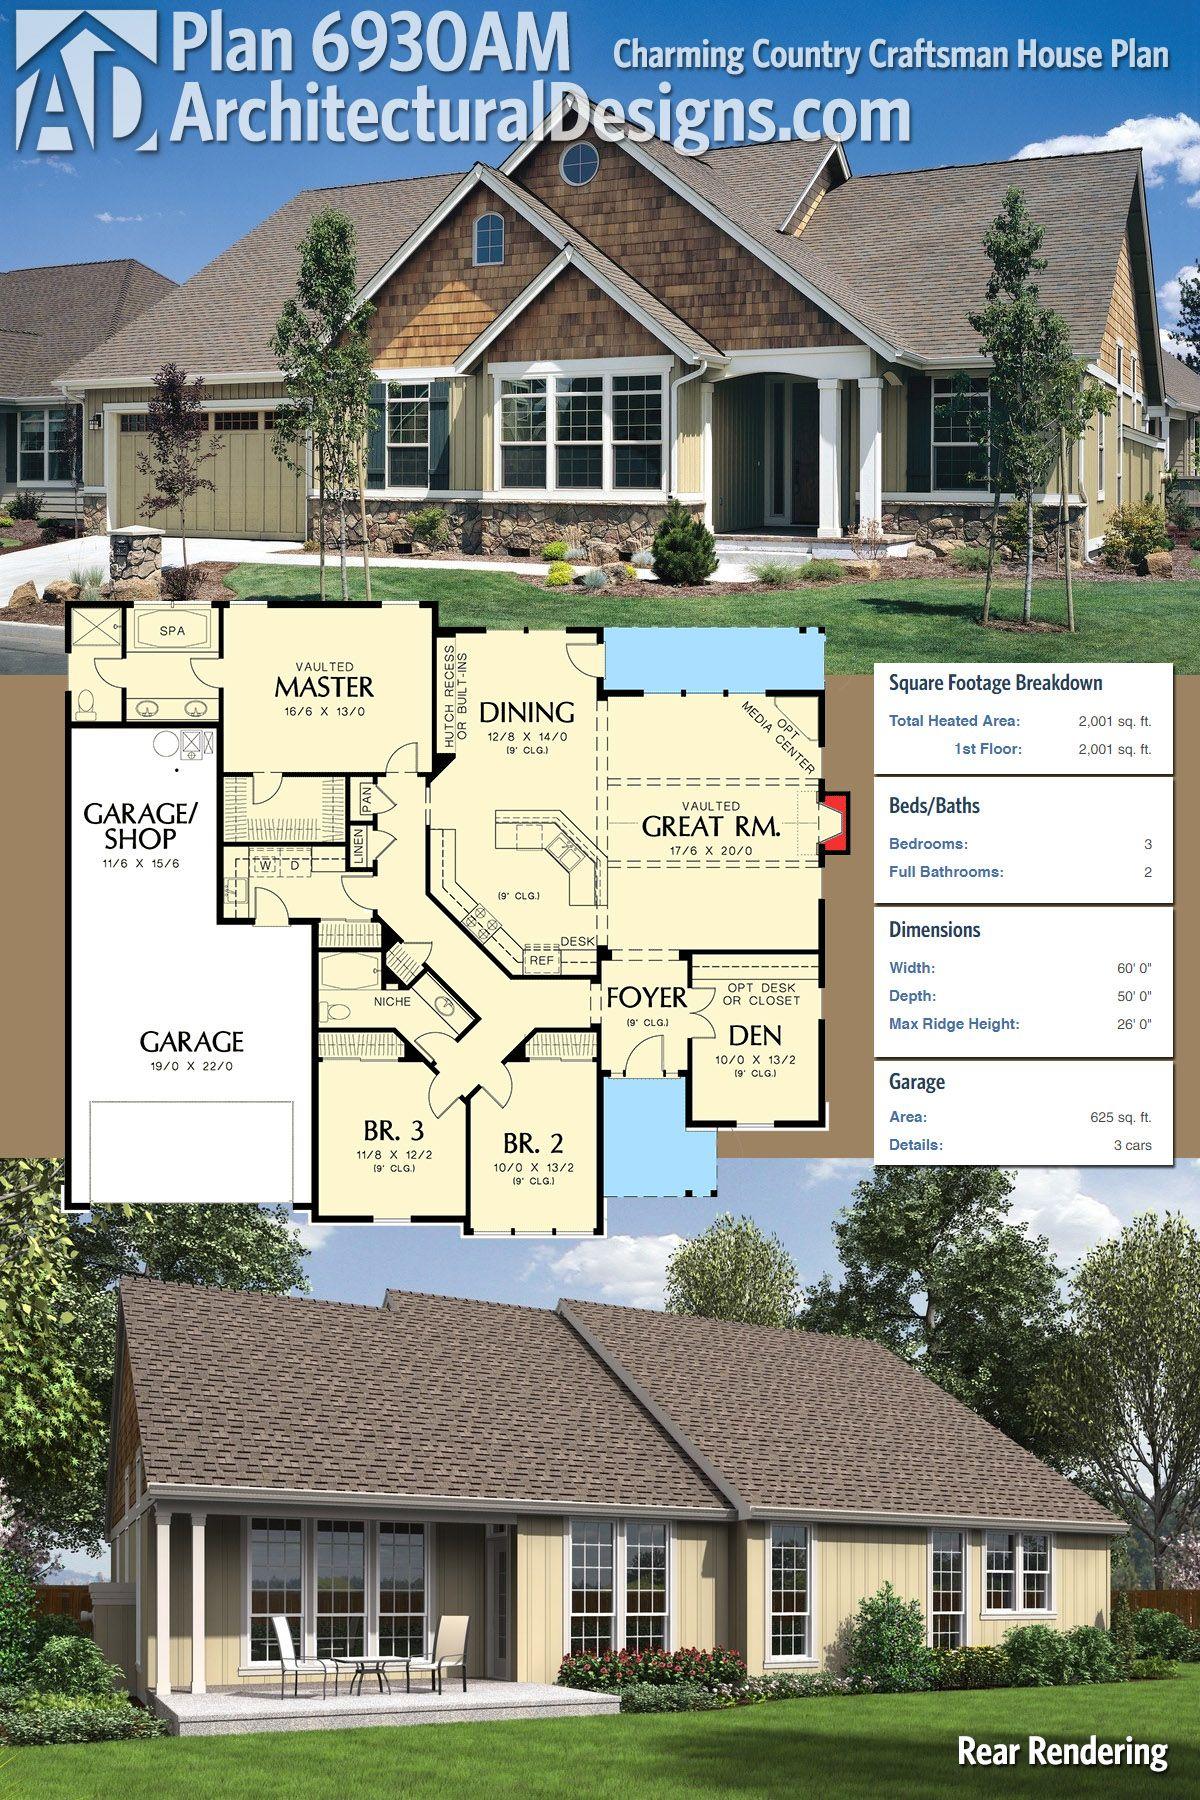 plan 6930am: charming country craftsman house plan | craftsman house